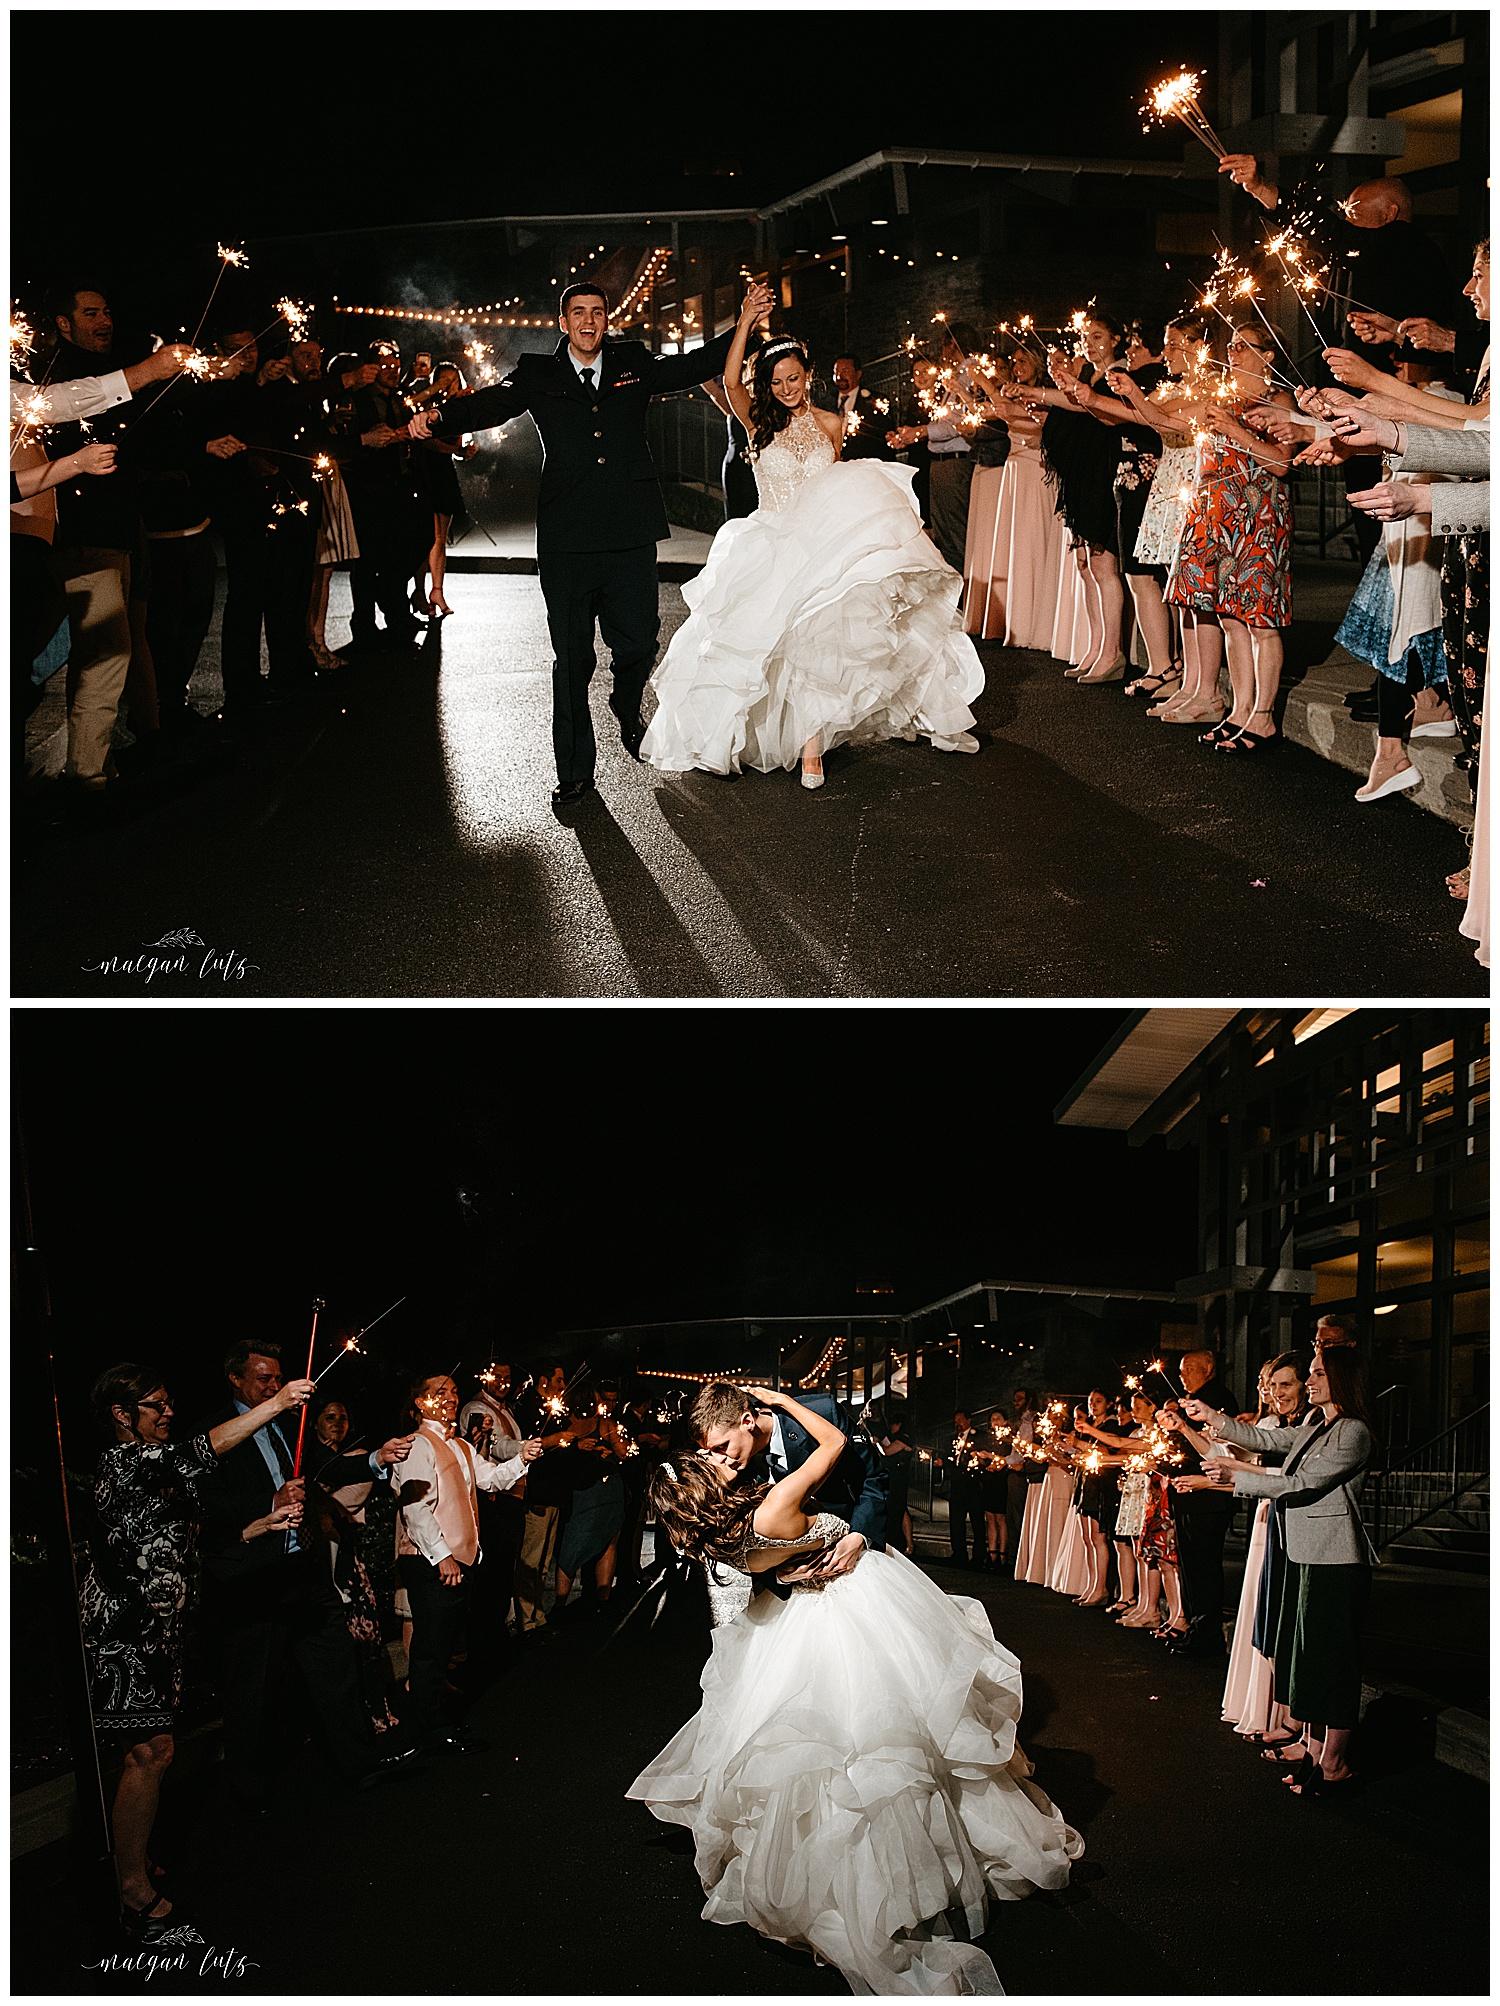 NEPA-Lehigh-Valley-Wedding-Photographer-at-Glen-Oak-Country-Club-Clarks-Summit-PA_0080.jpg